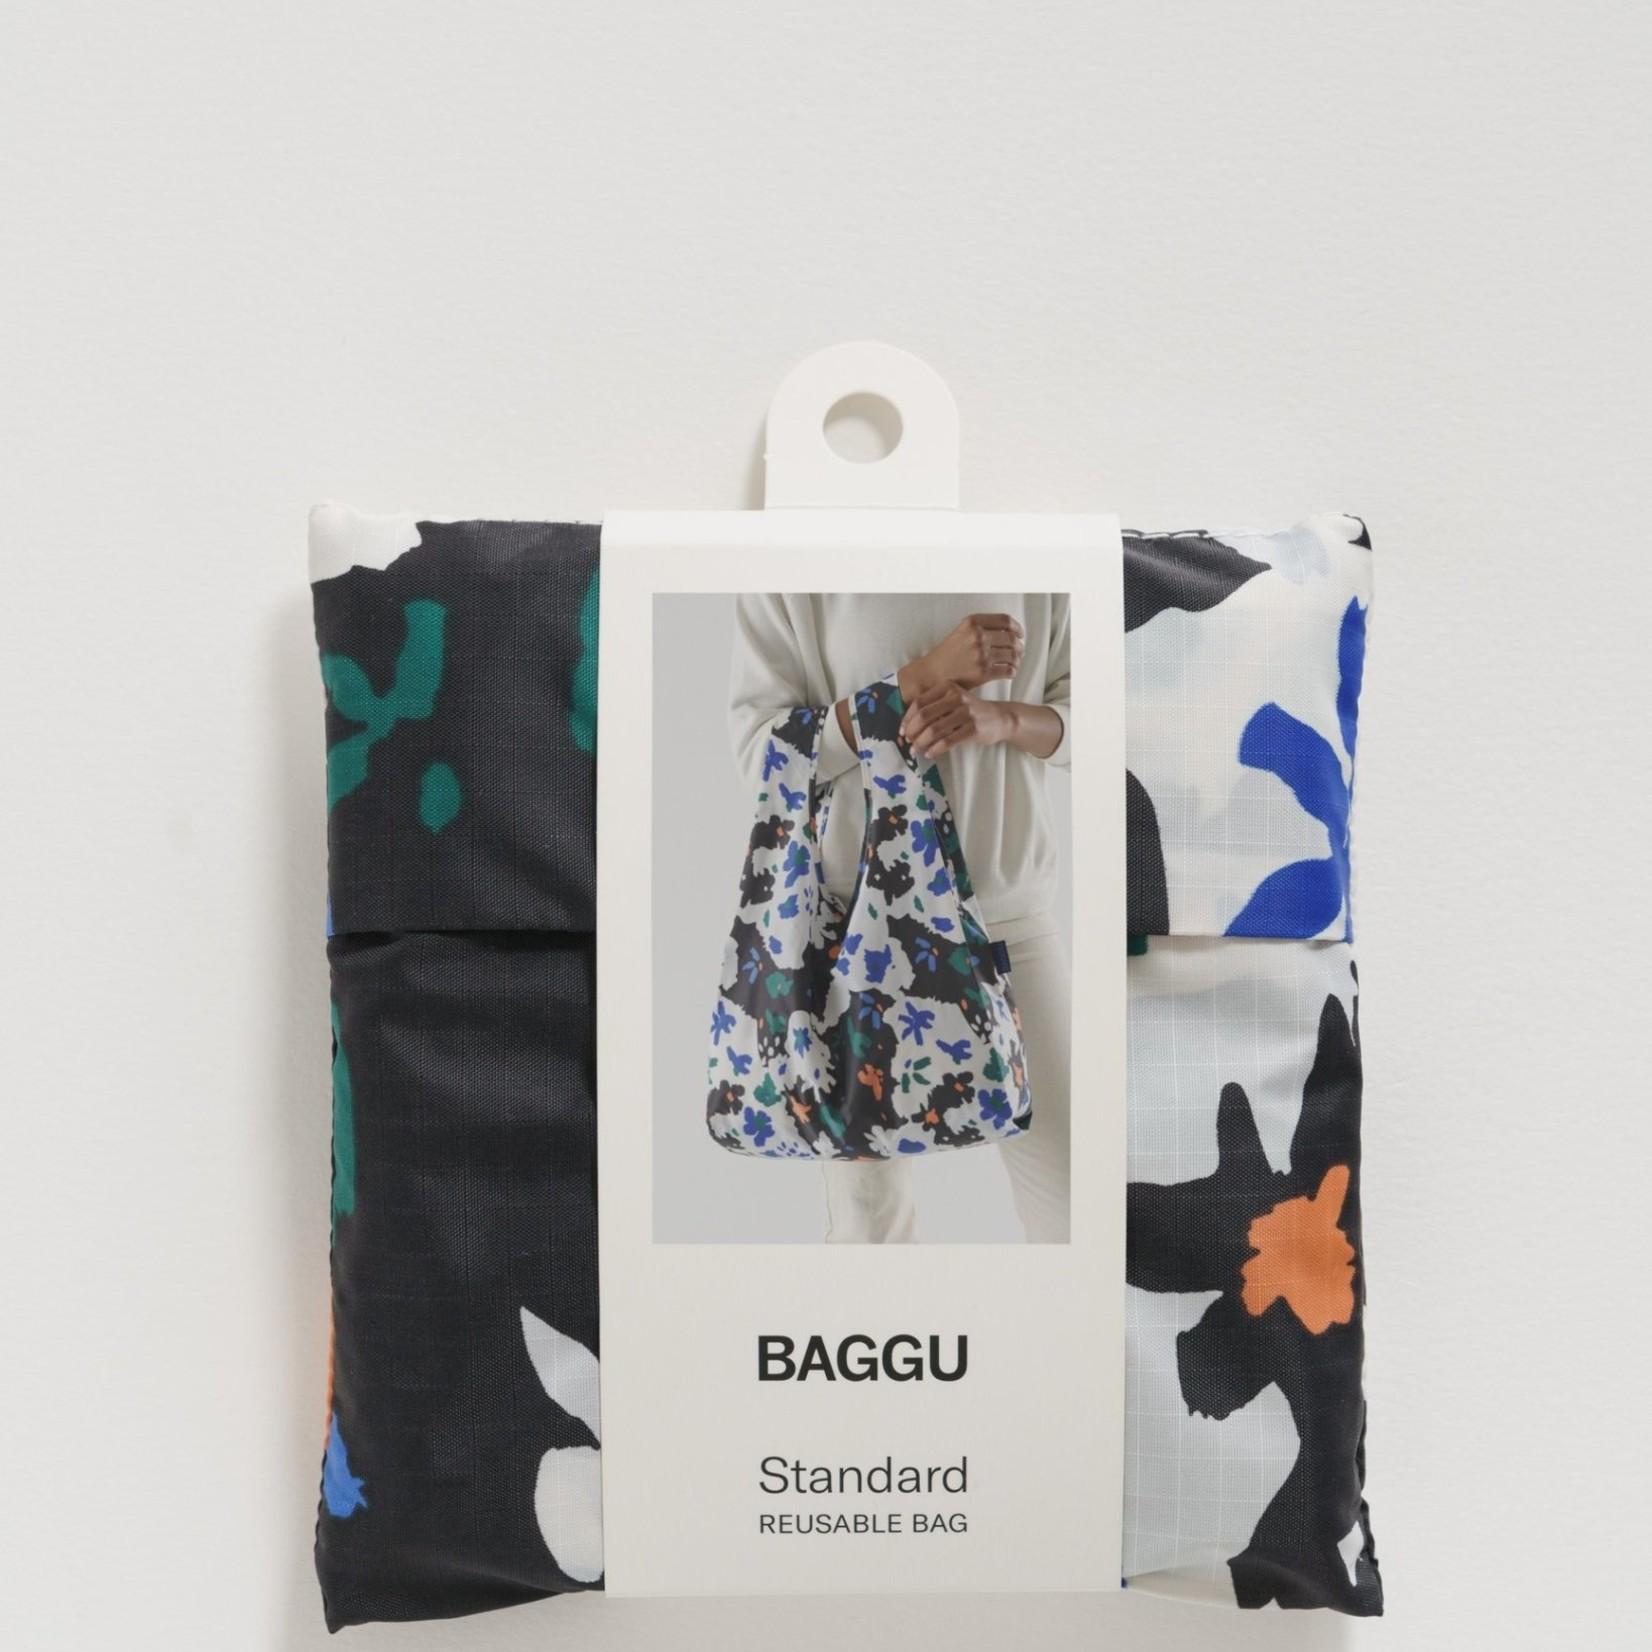 Baggu Baggu Reusable Bag Standard - Flowers Litho Floral